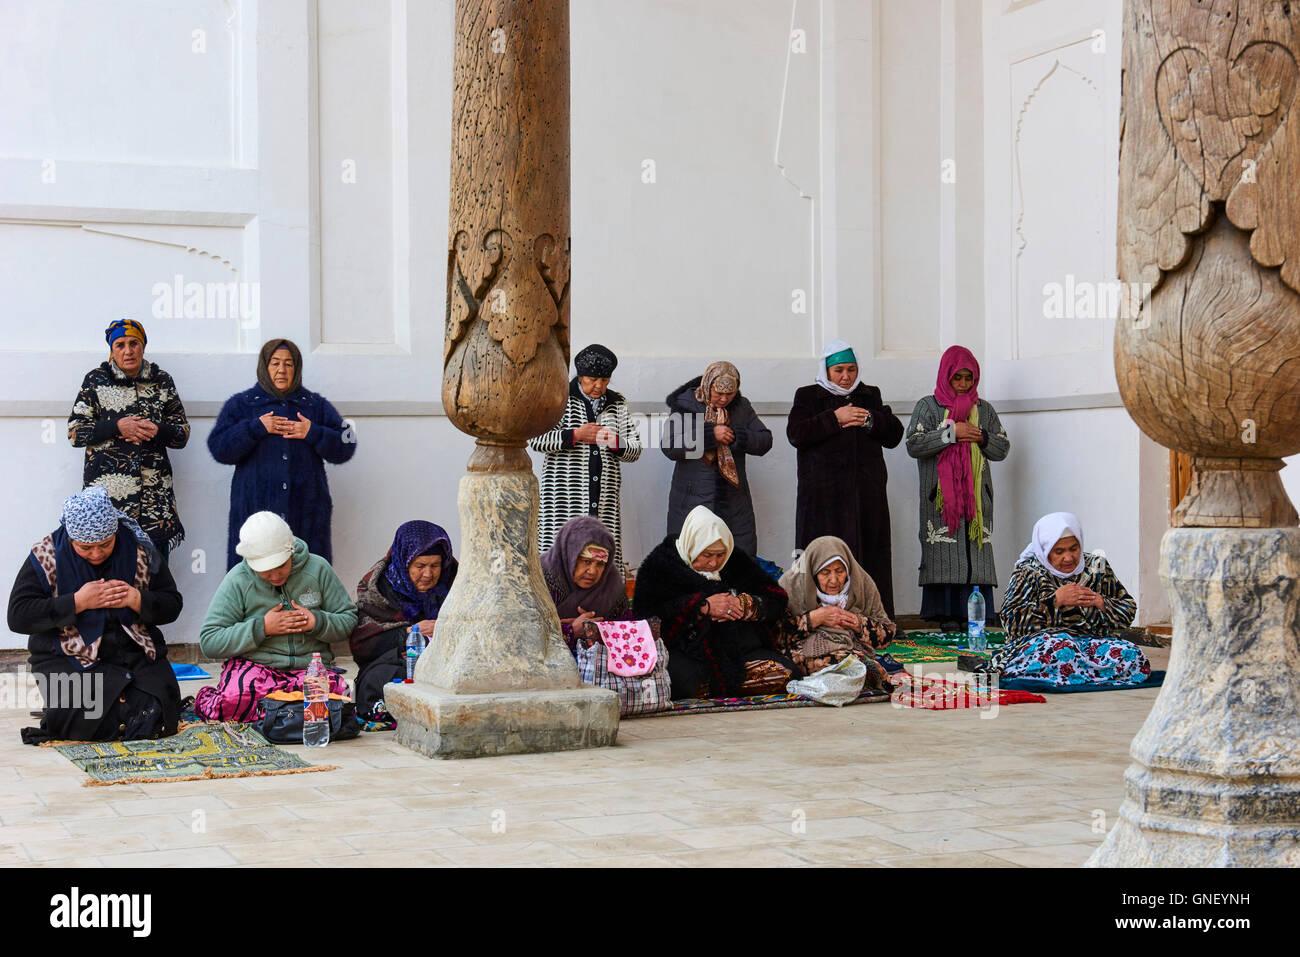 Uzbekistan, Bukhara, Unesco world heritage, Bahouddin Naqshbandi mosque, sufi spirituel memorial, prayer - Stock Image